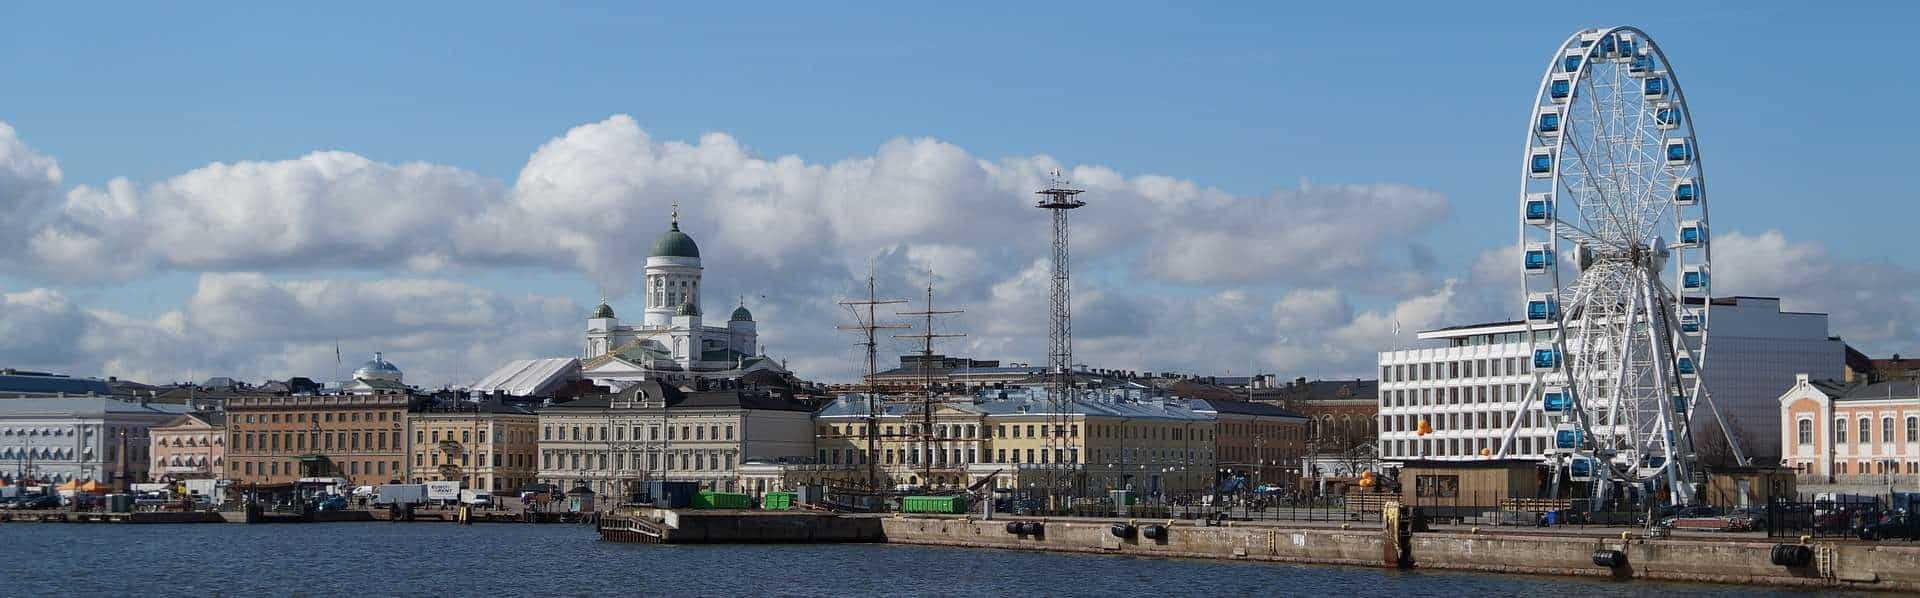 Panorama of Helsinki